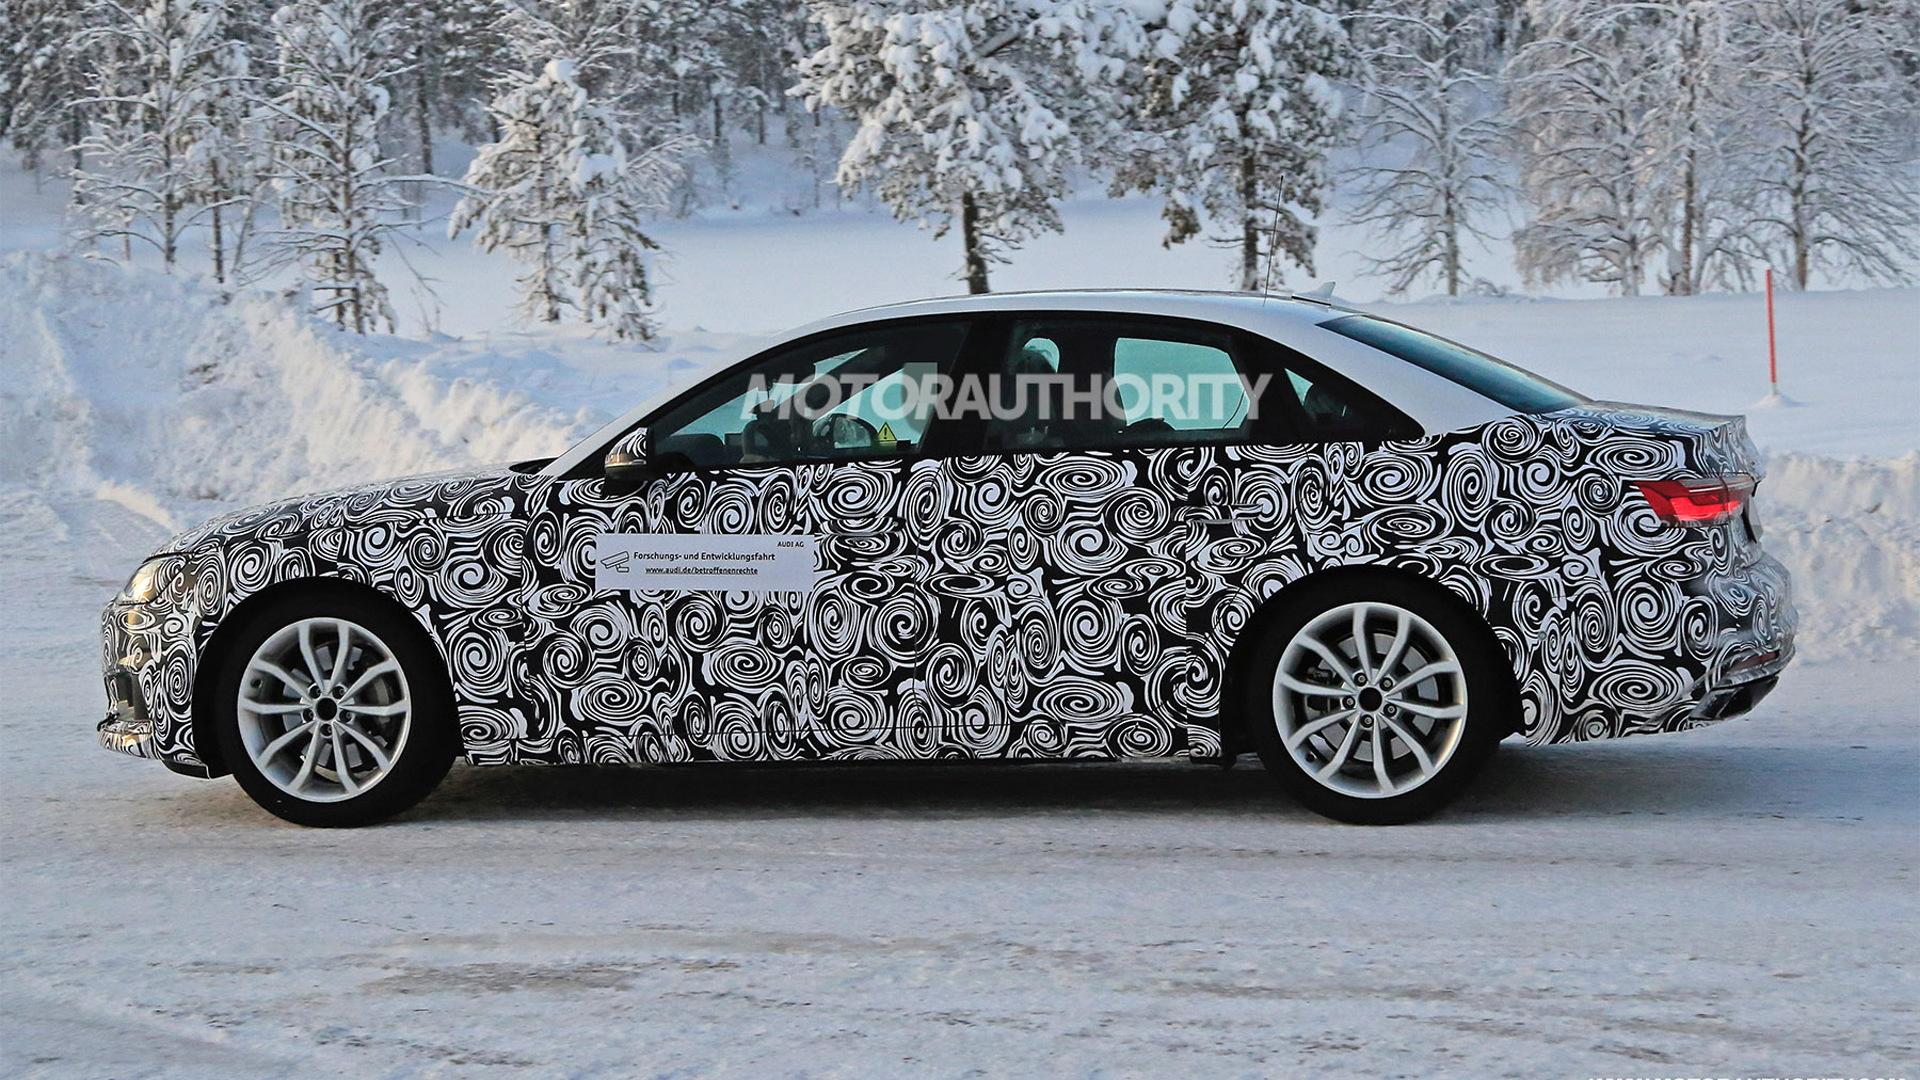 2021 Audi A4 facelift spy shots - Image via S. Baldauf/SB-Medien